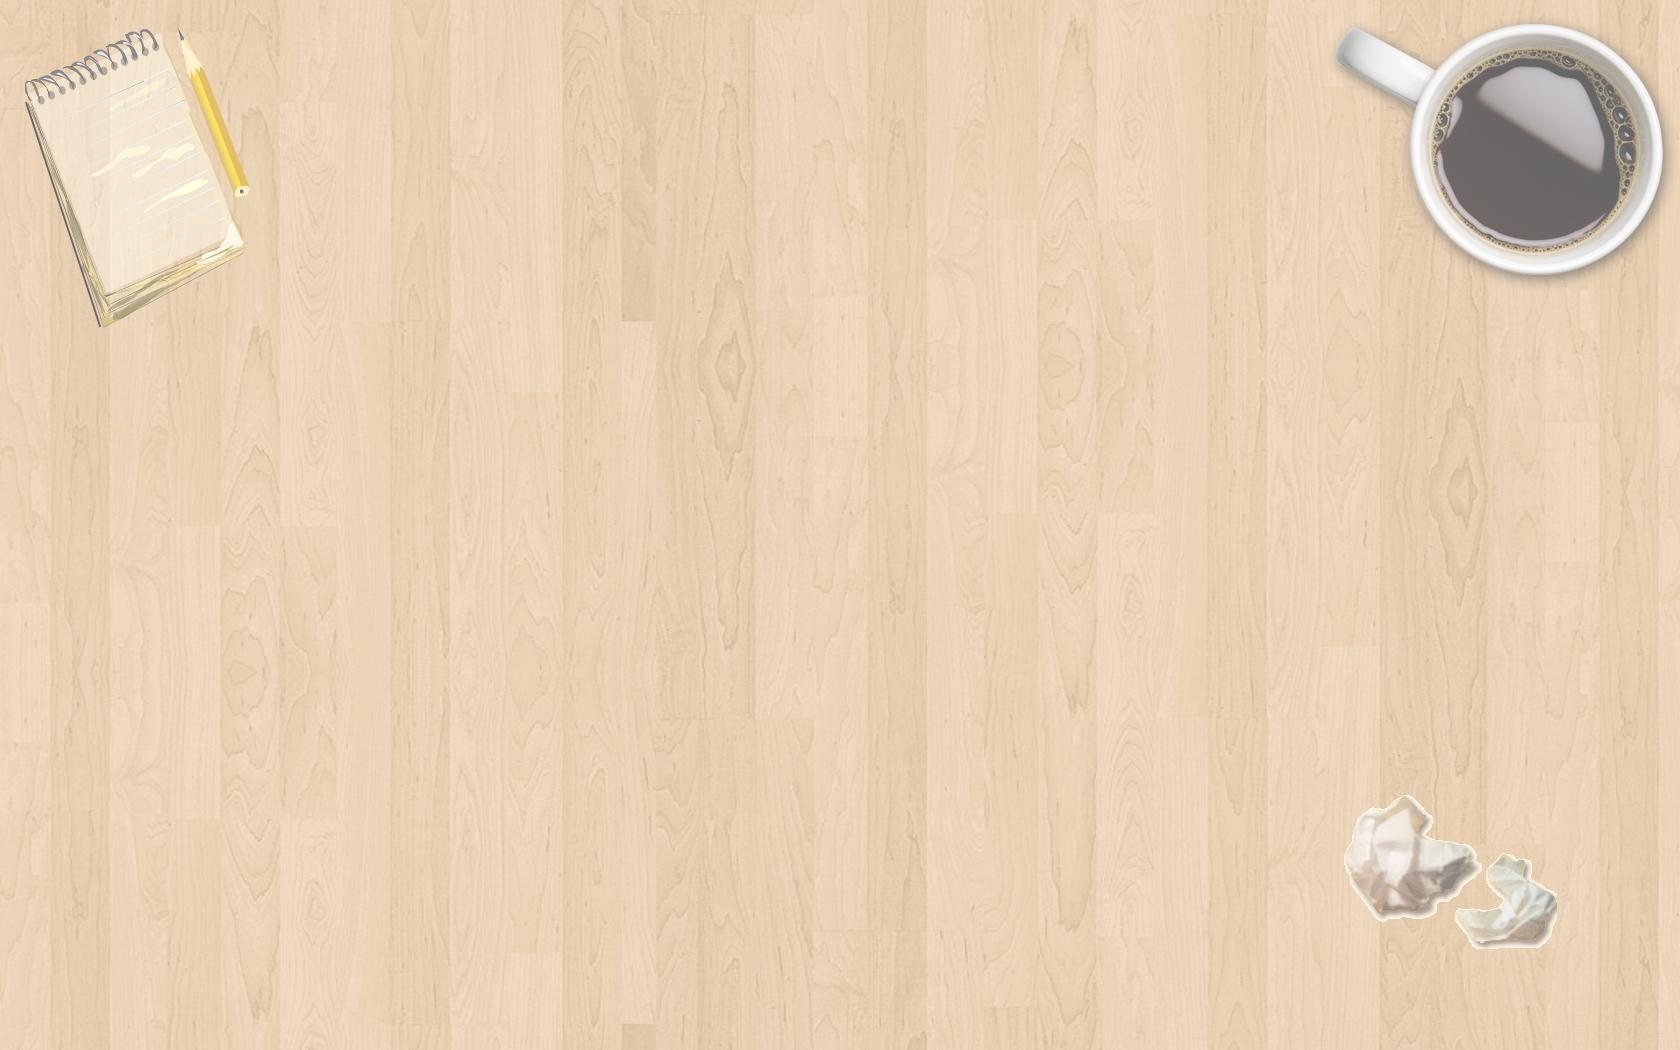 office style desktop background Wallpaper Downloads 1680x1050